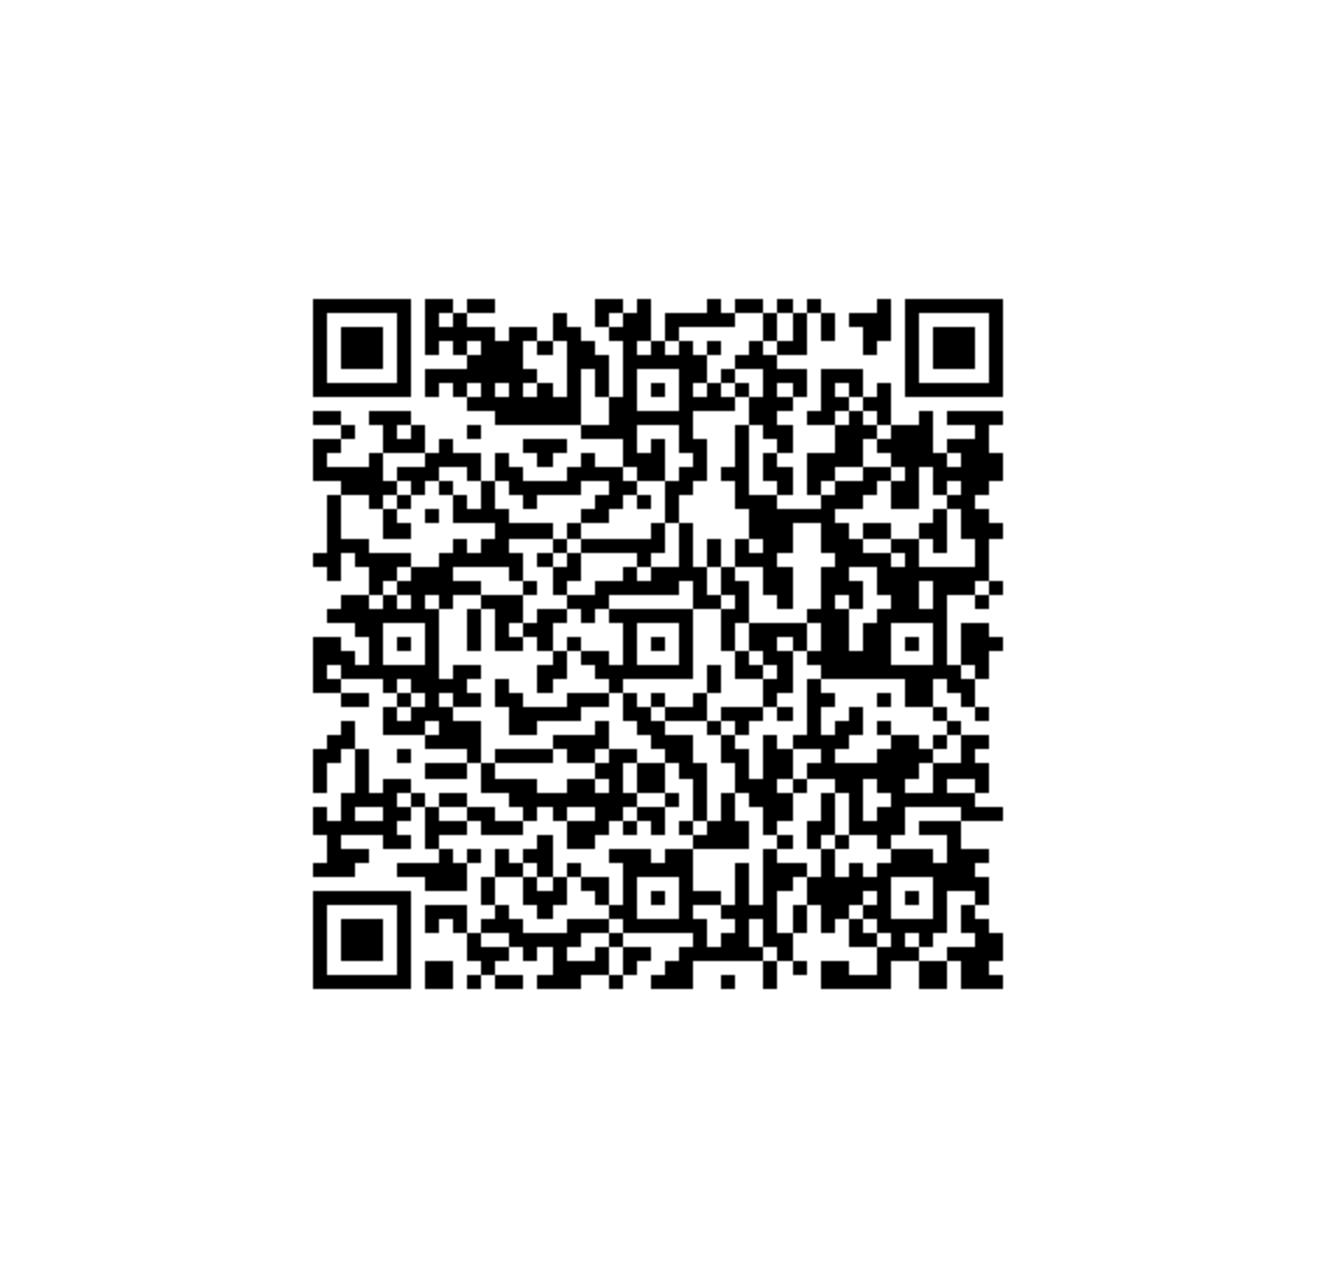 mmexport1626318999070.png